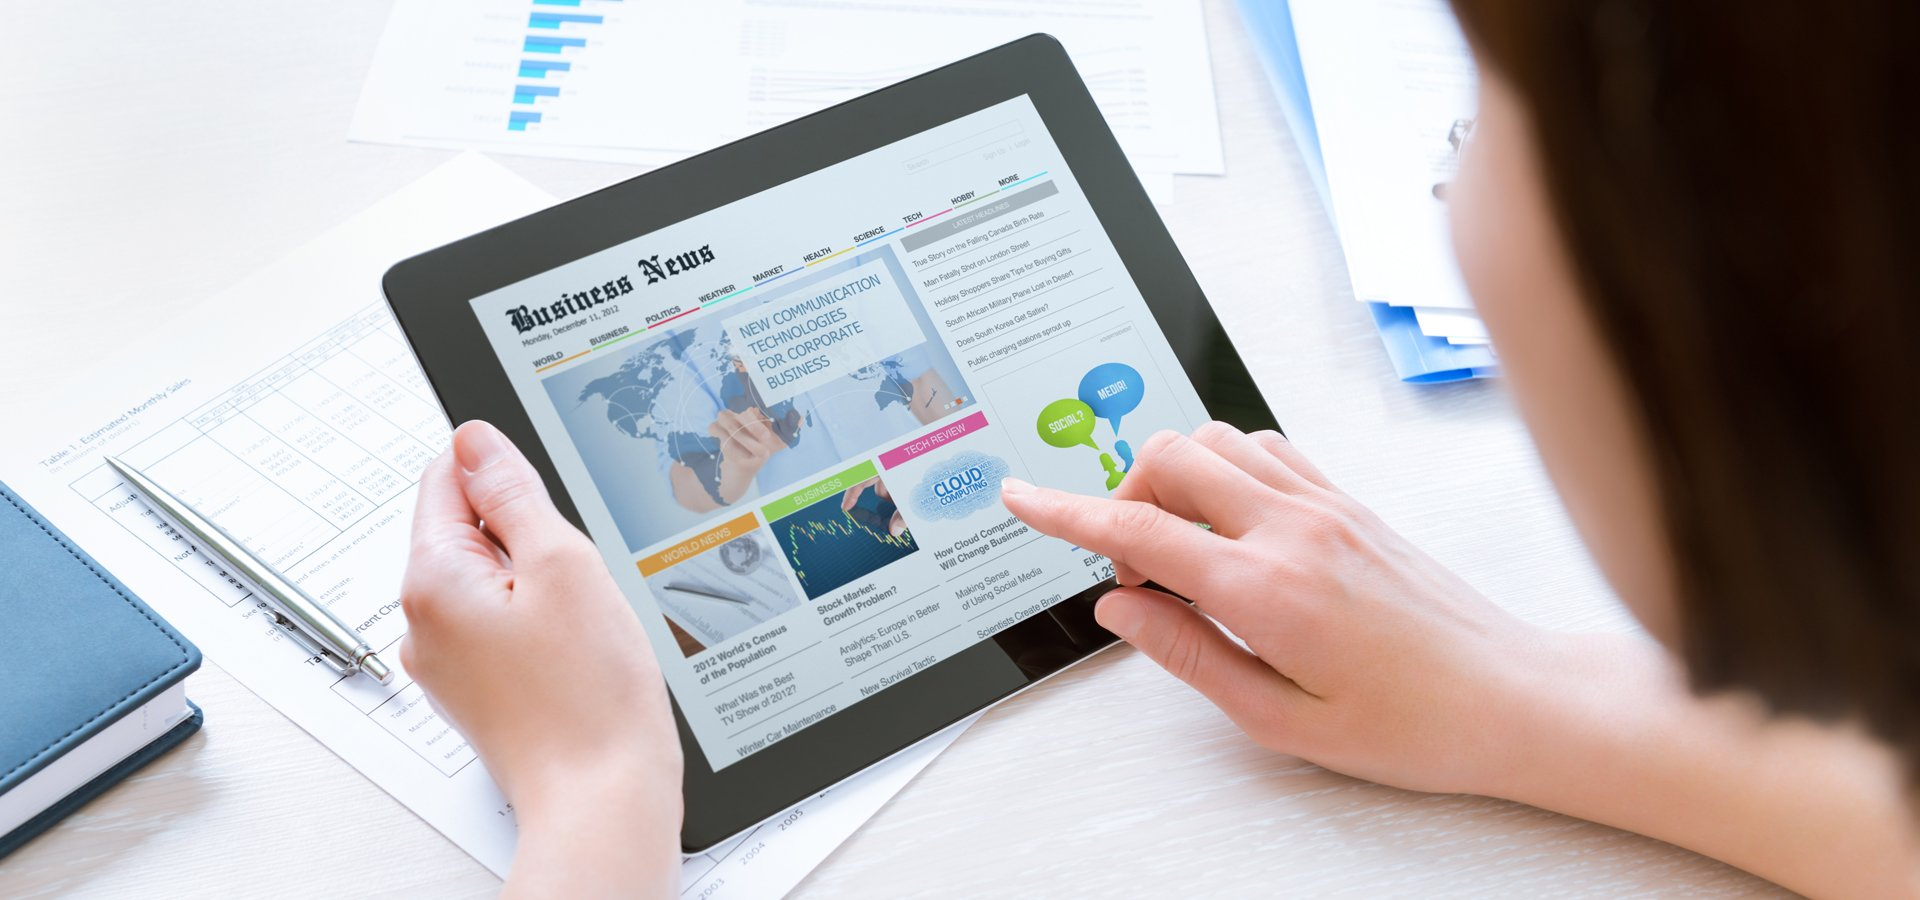 tablet user